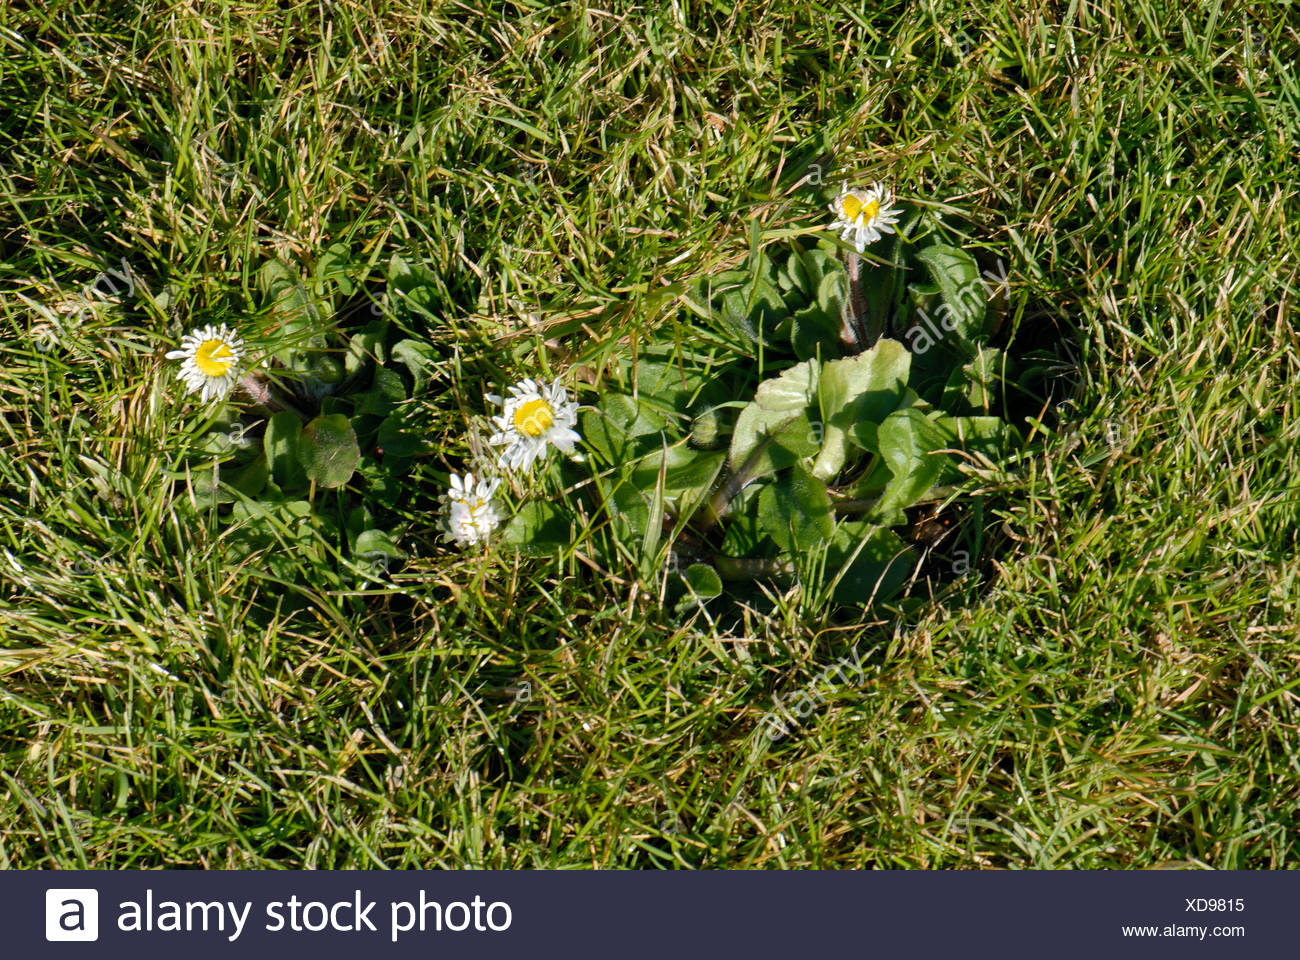 Flowering daisy Bellis perennis in a garden lawn - Stock Image